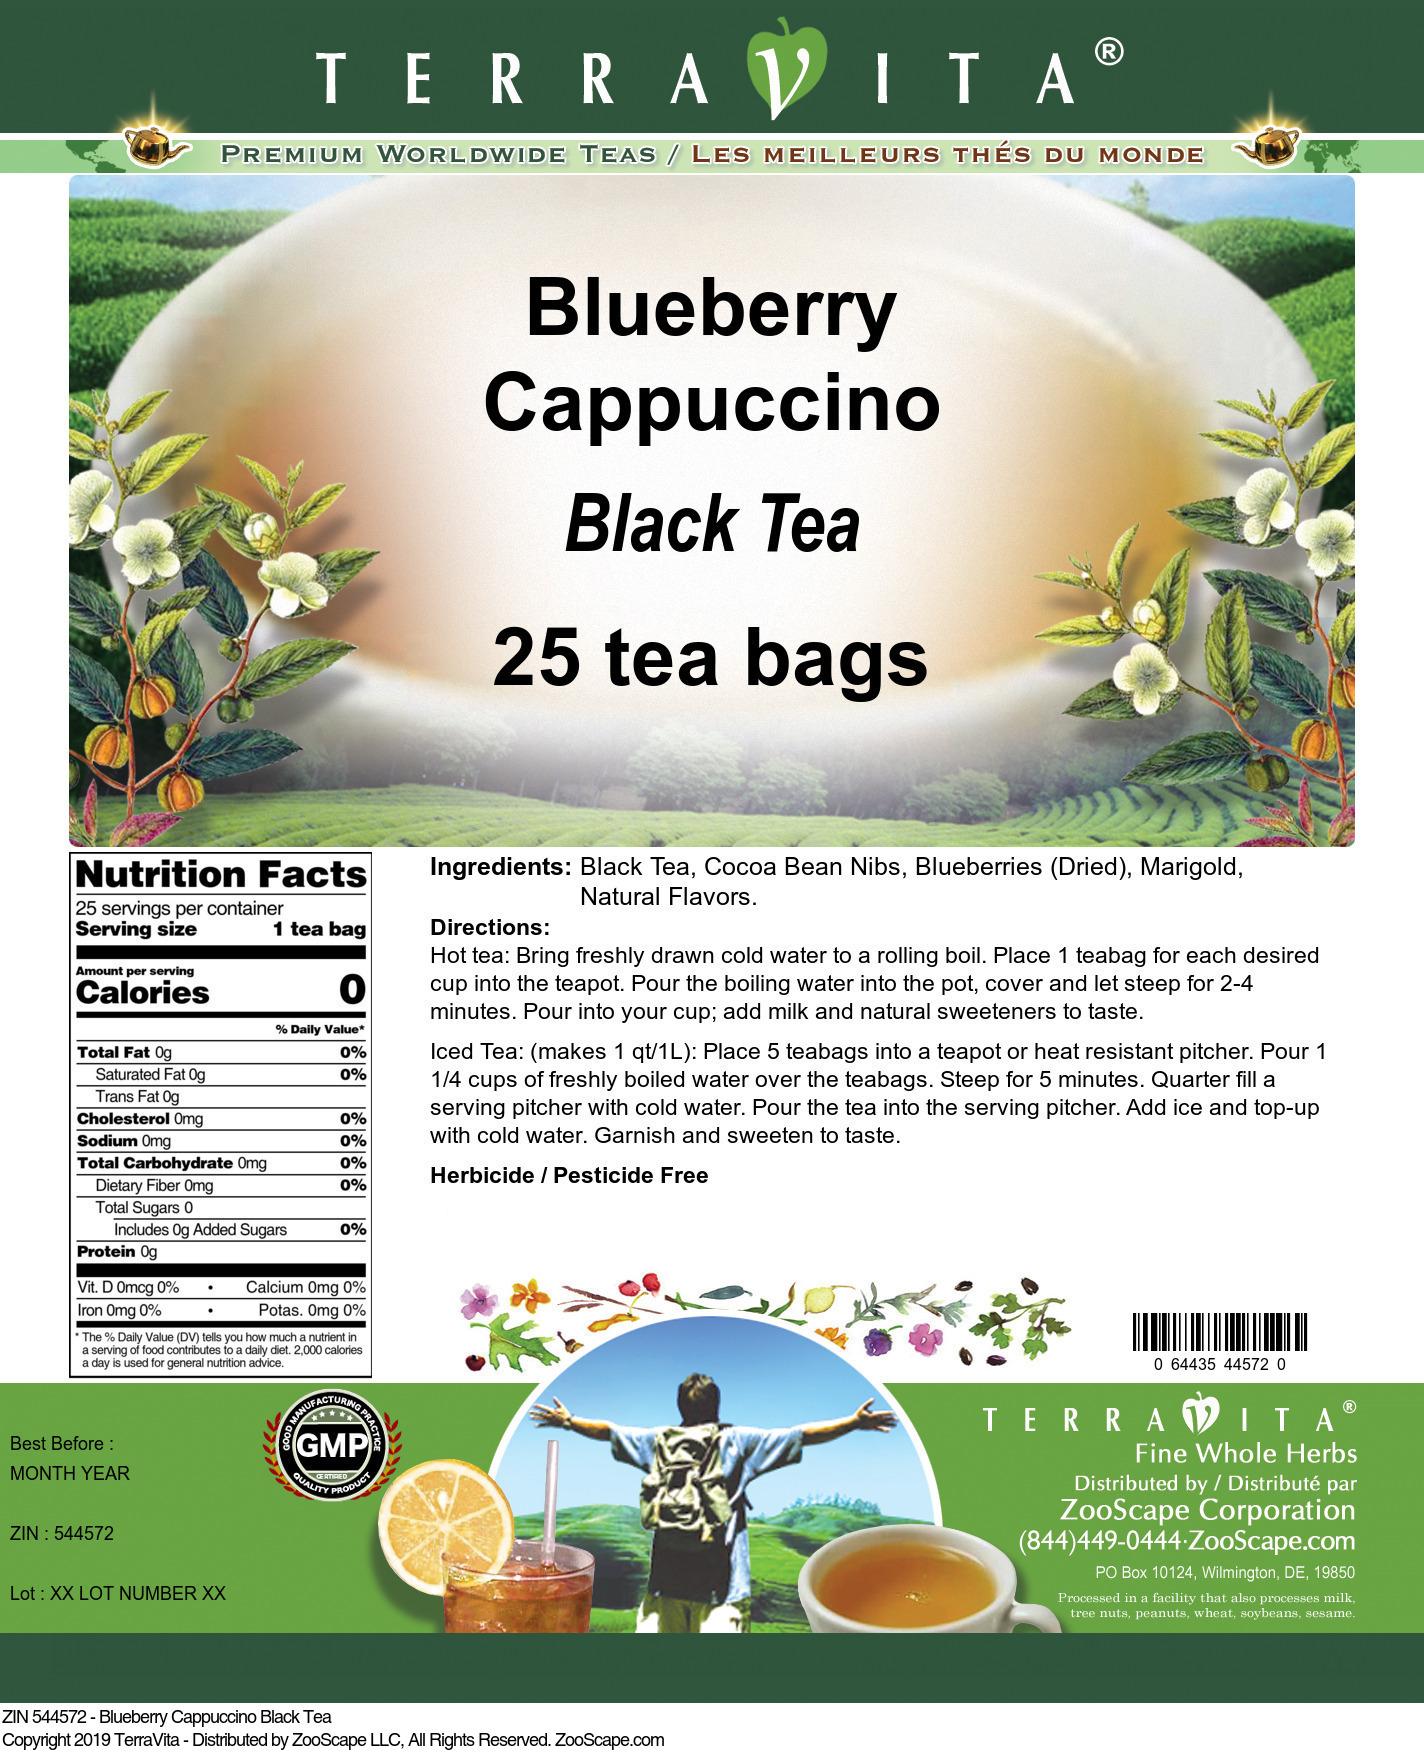 Blueberry Cappuccino Black Tea